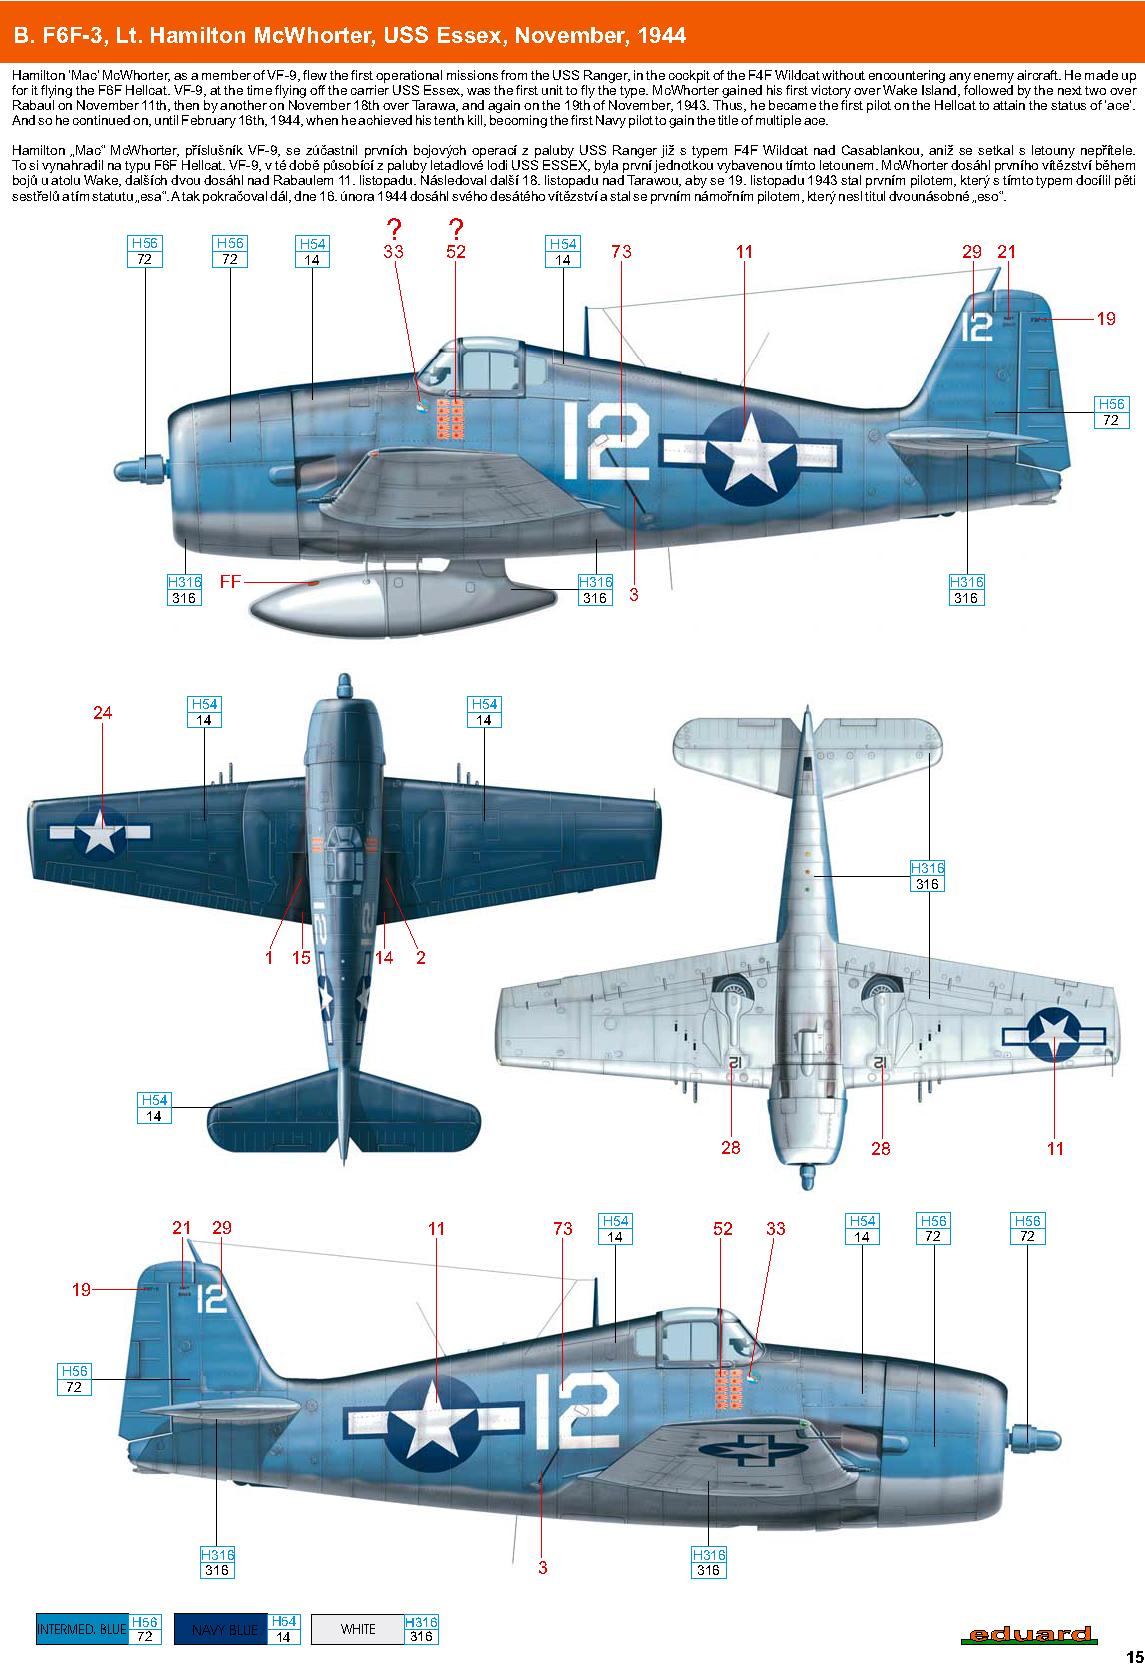 Grumman F6F 3 Hellcat VF 9 White 12 Lt Hamilton McWhorter USS Essex November 1944 0A